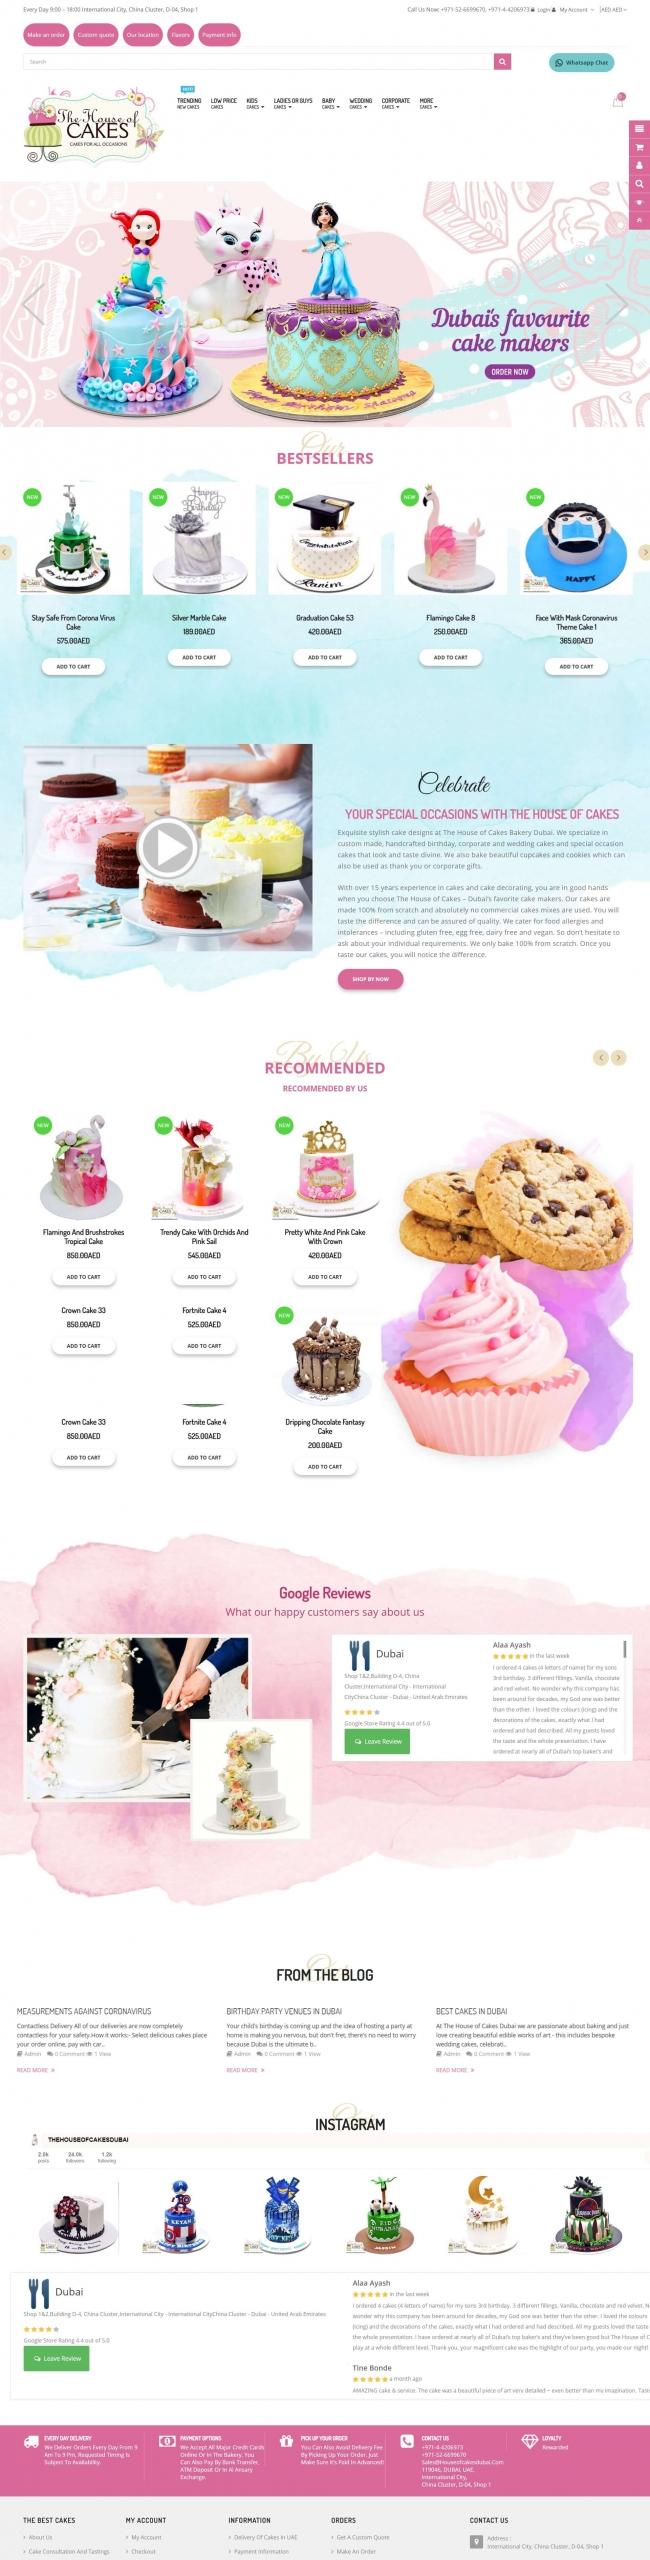 houseofcakesdubai-store-CherryAdv